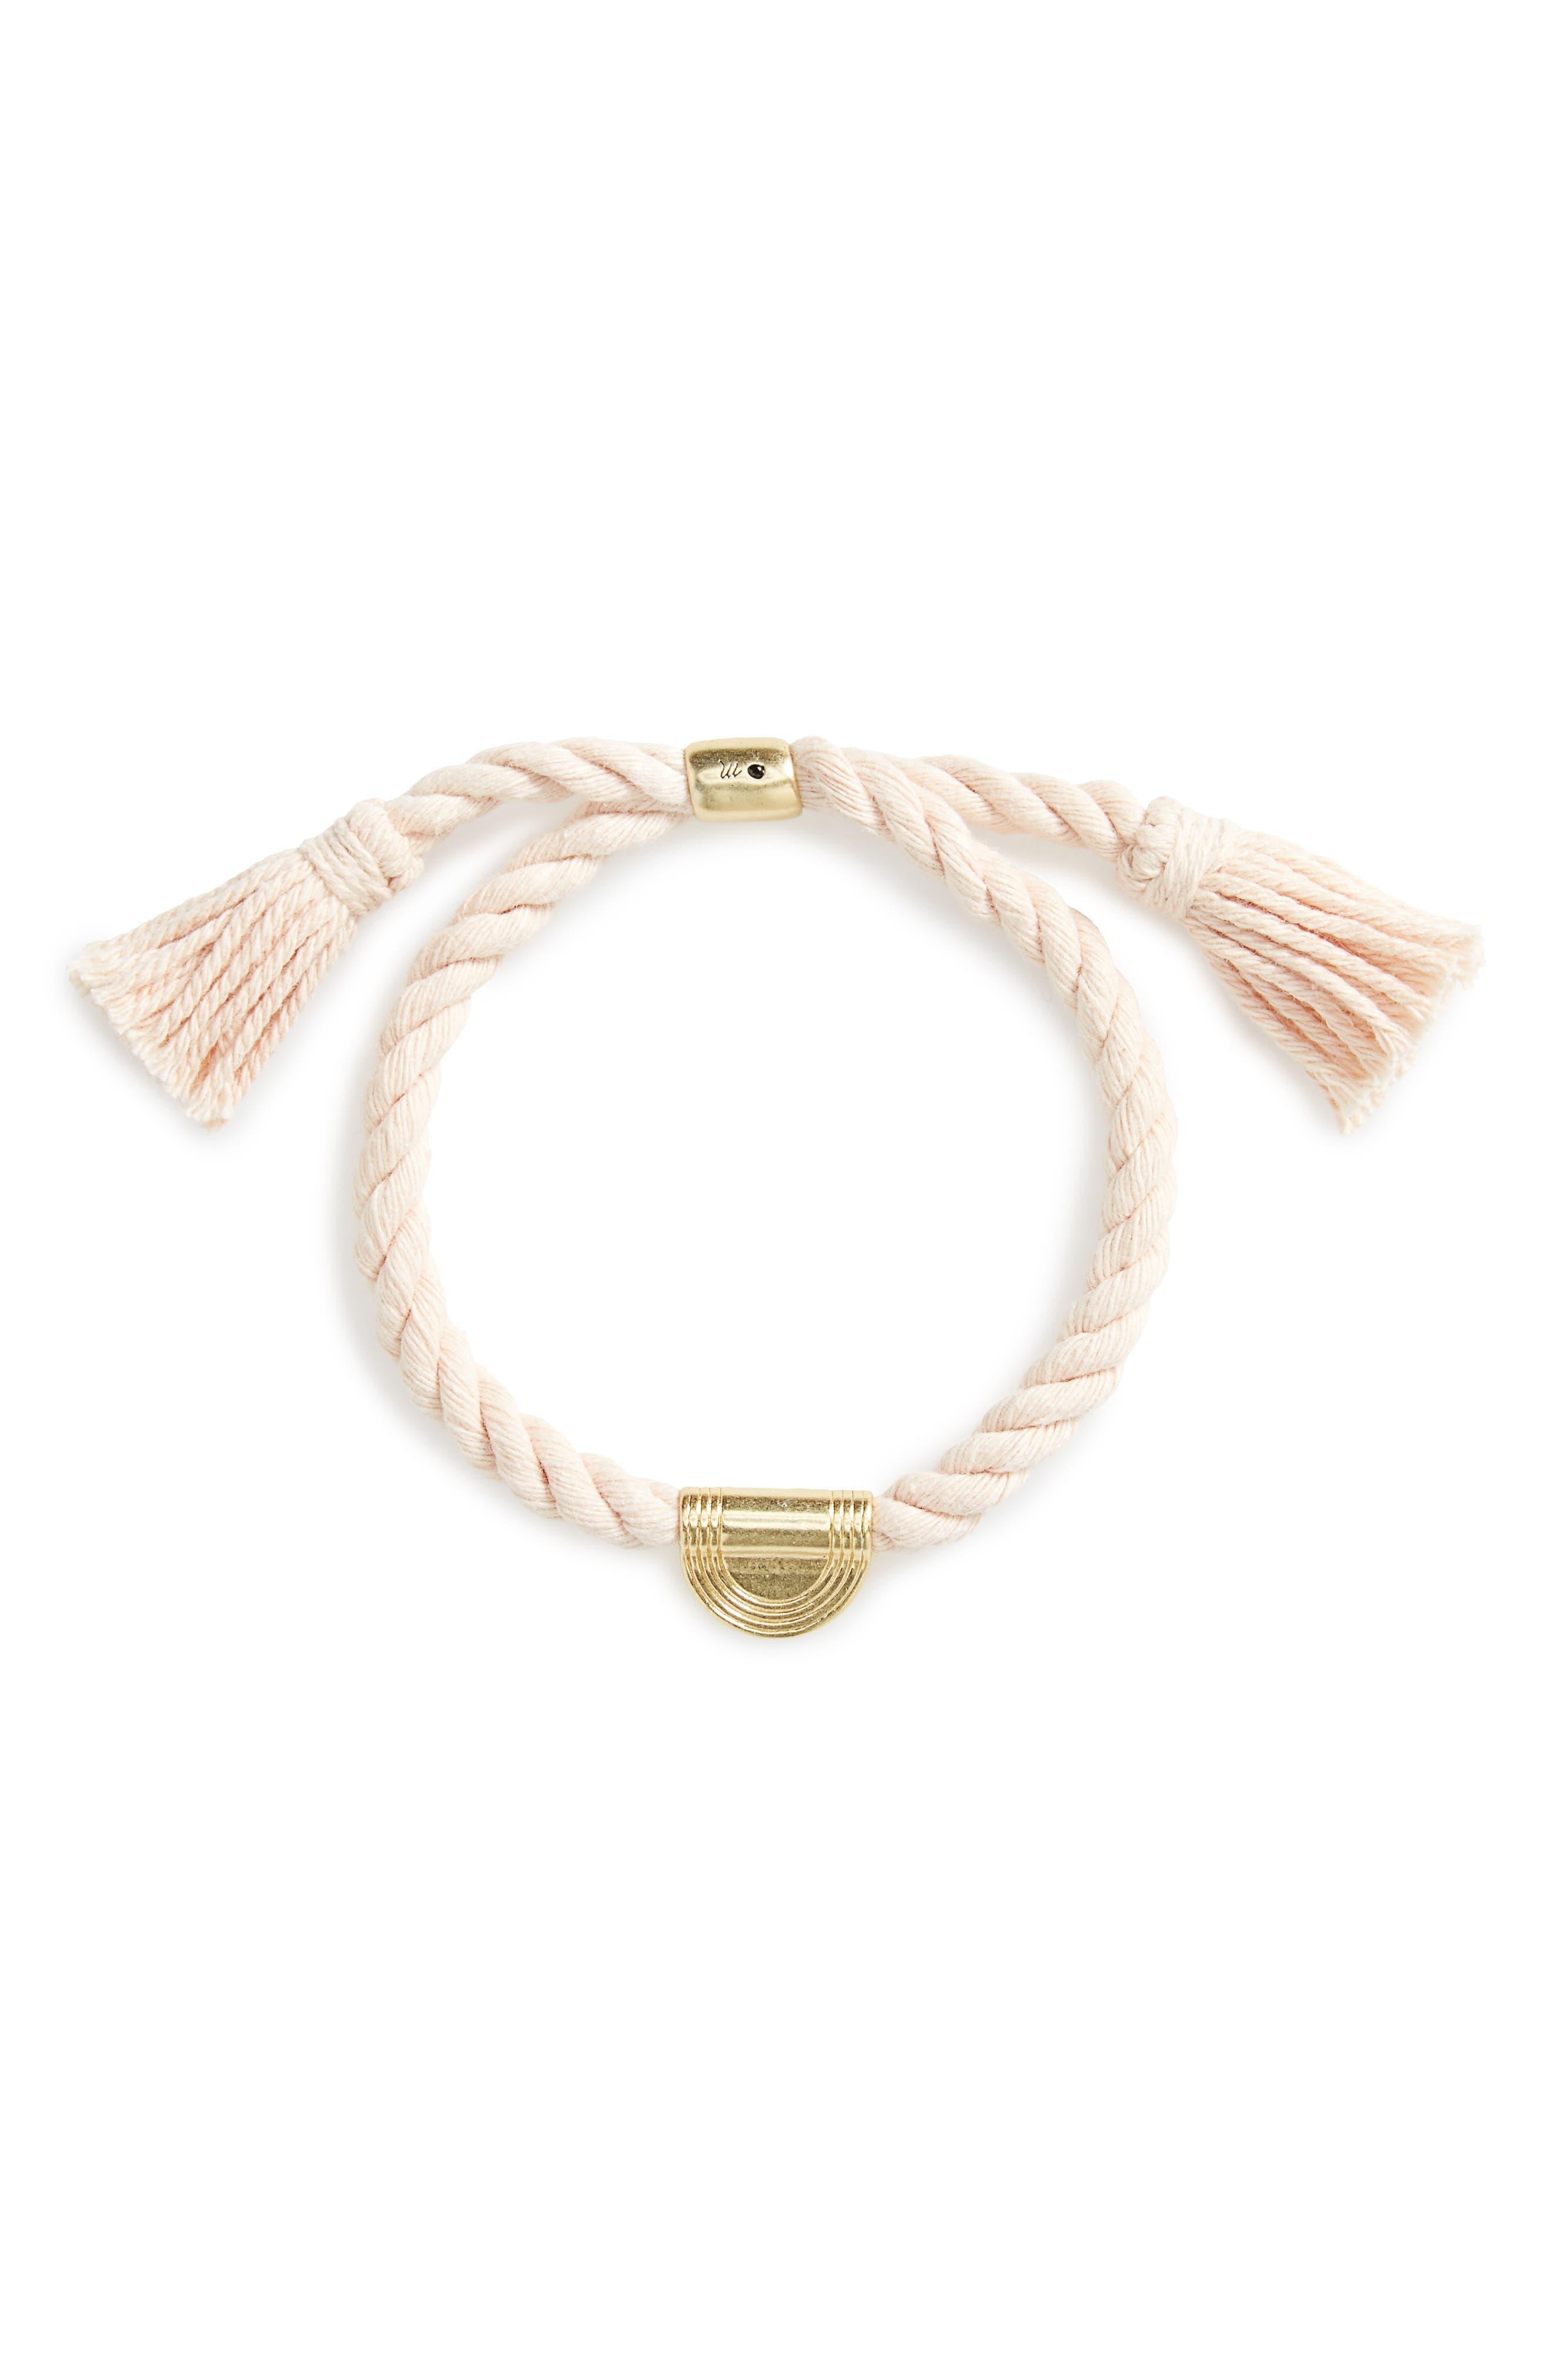 Madewell Cord Tassel Bracelet